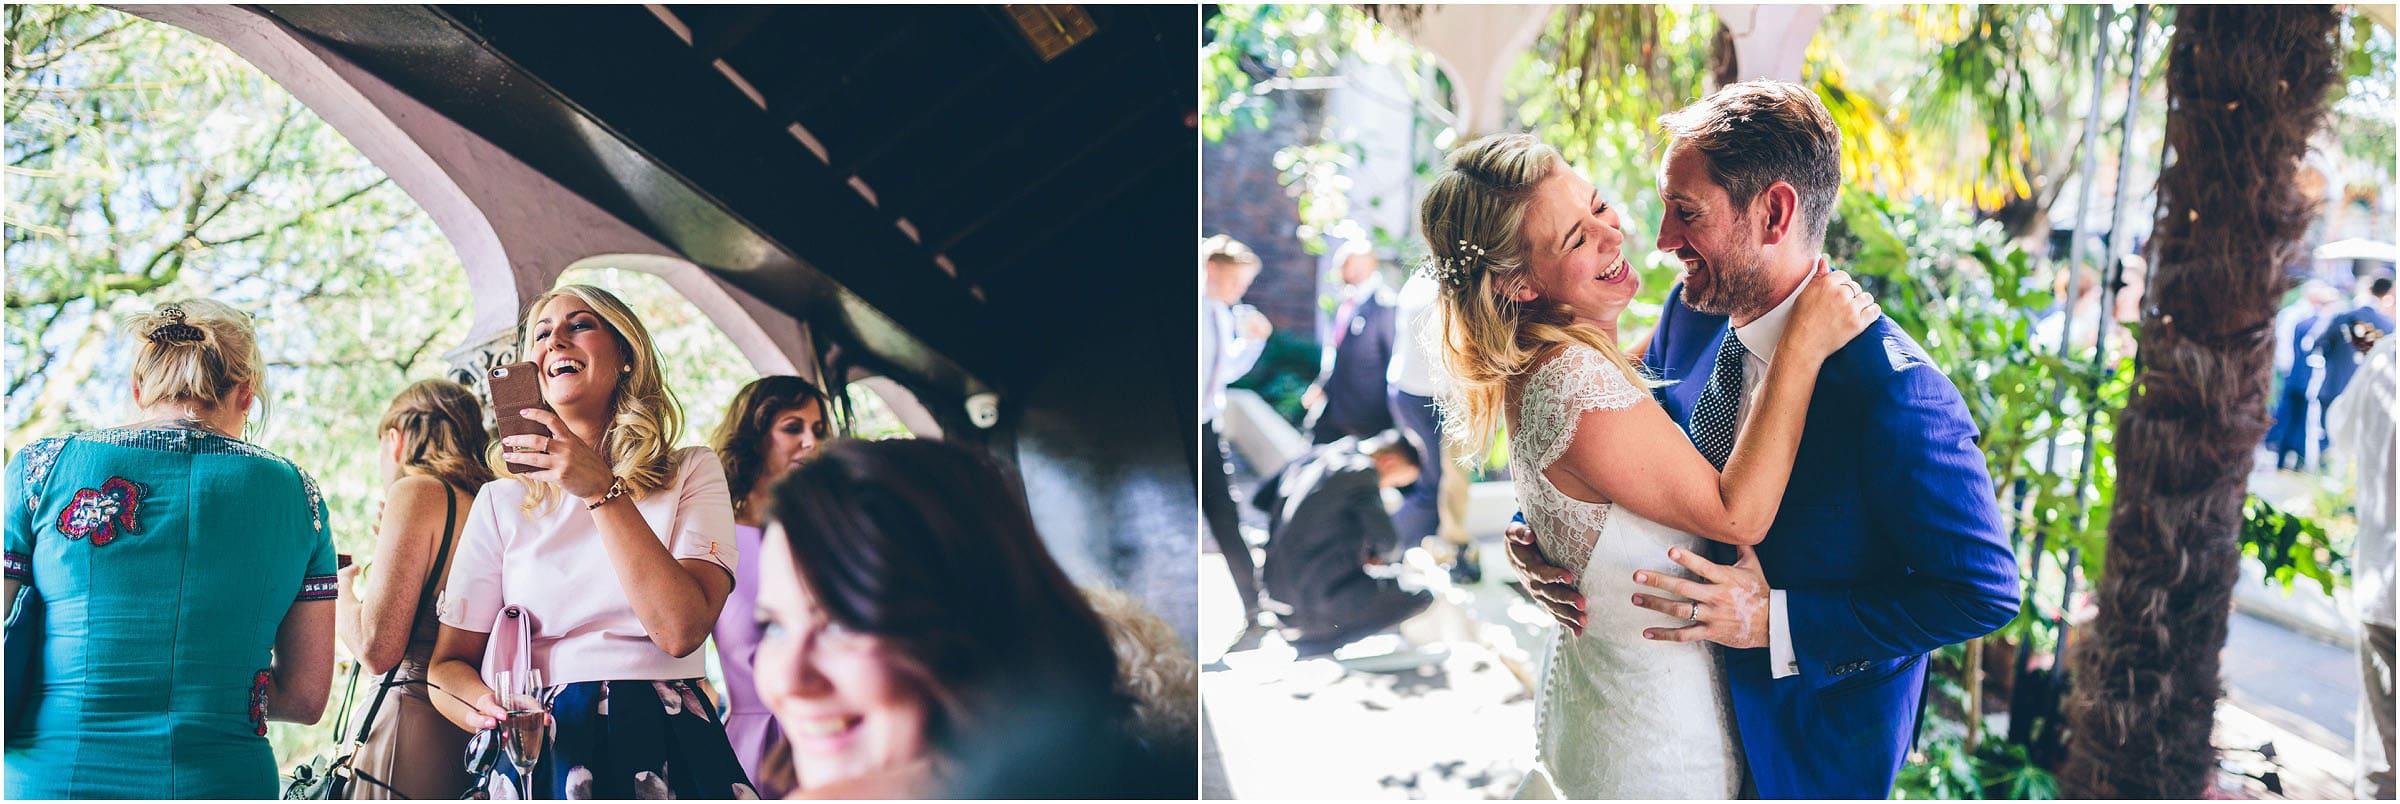 Kensington_Roof_Gardens_Wedding_Photography_0057